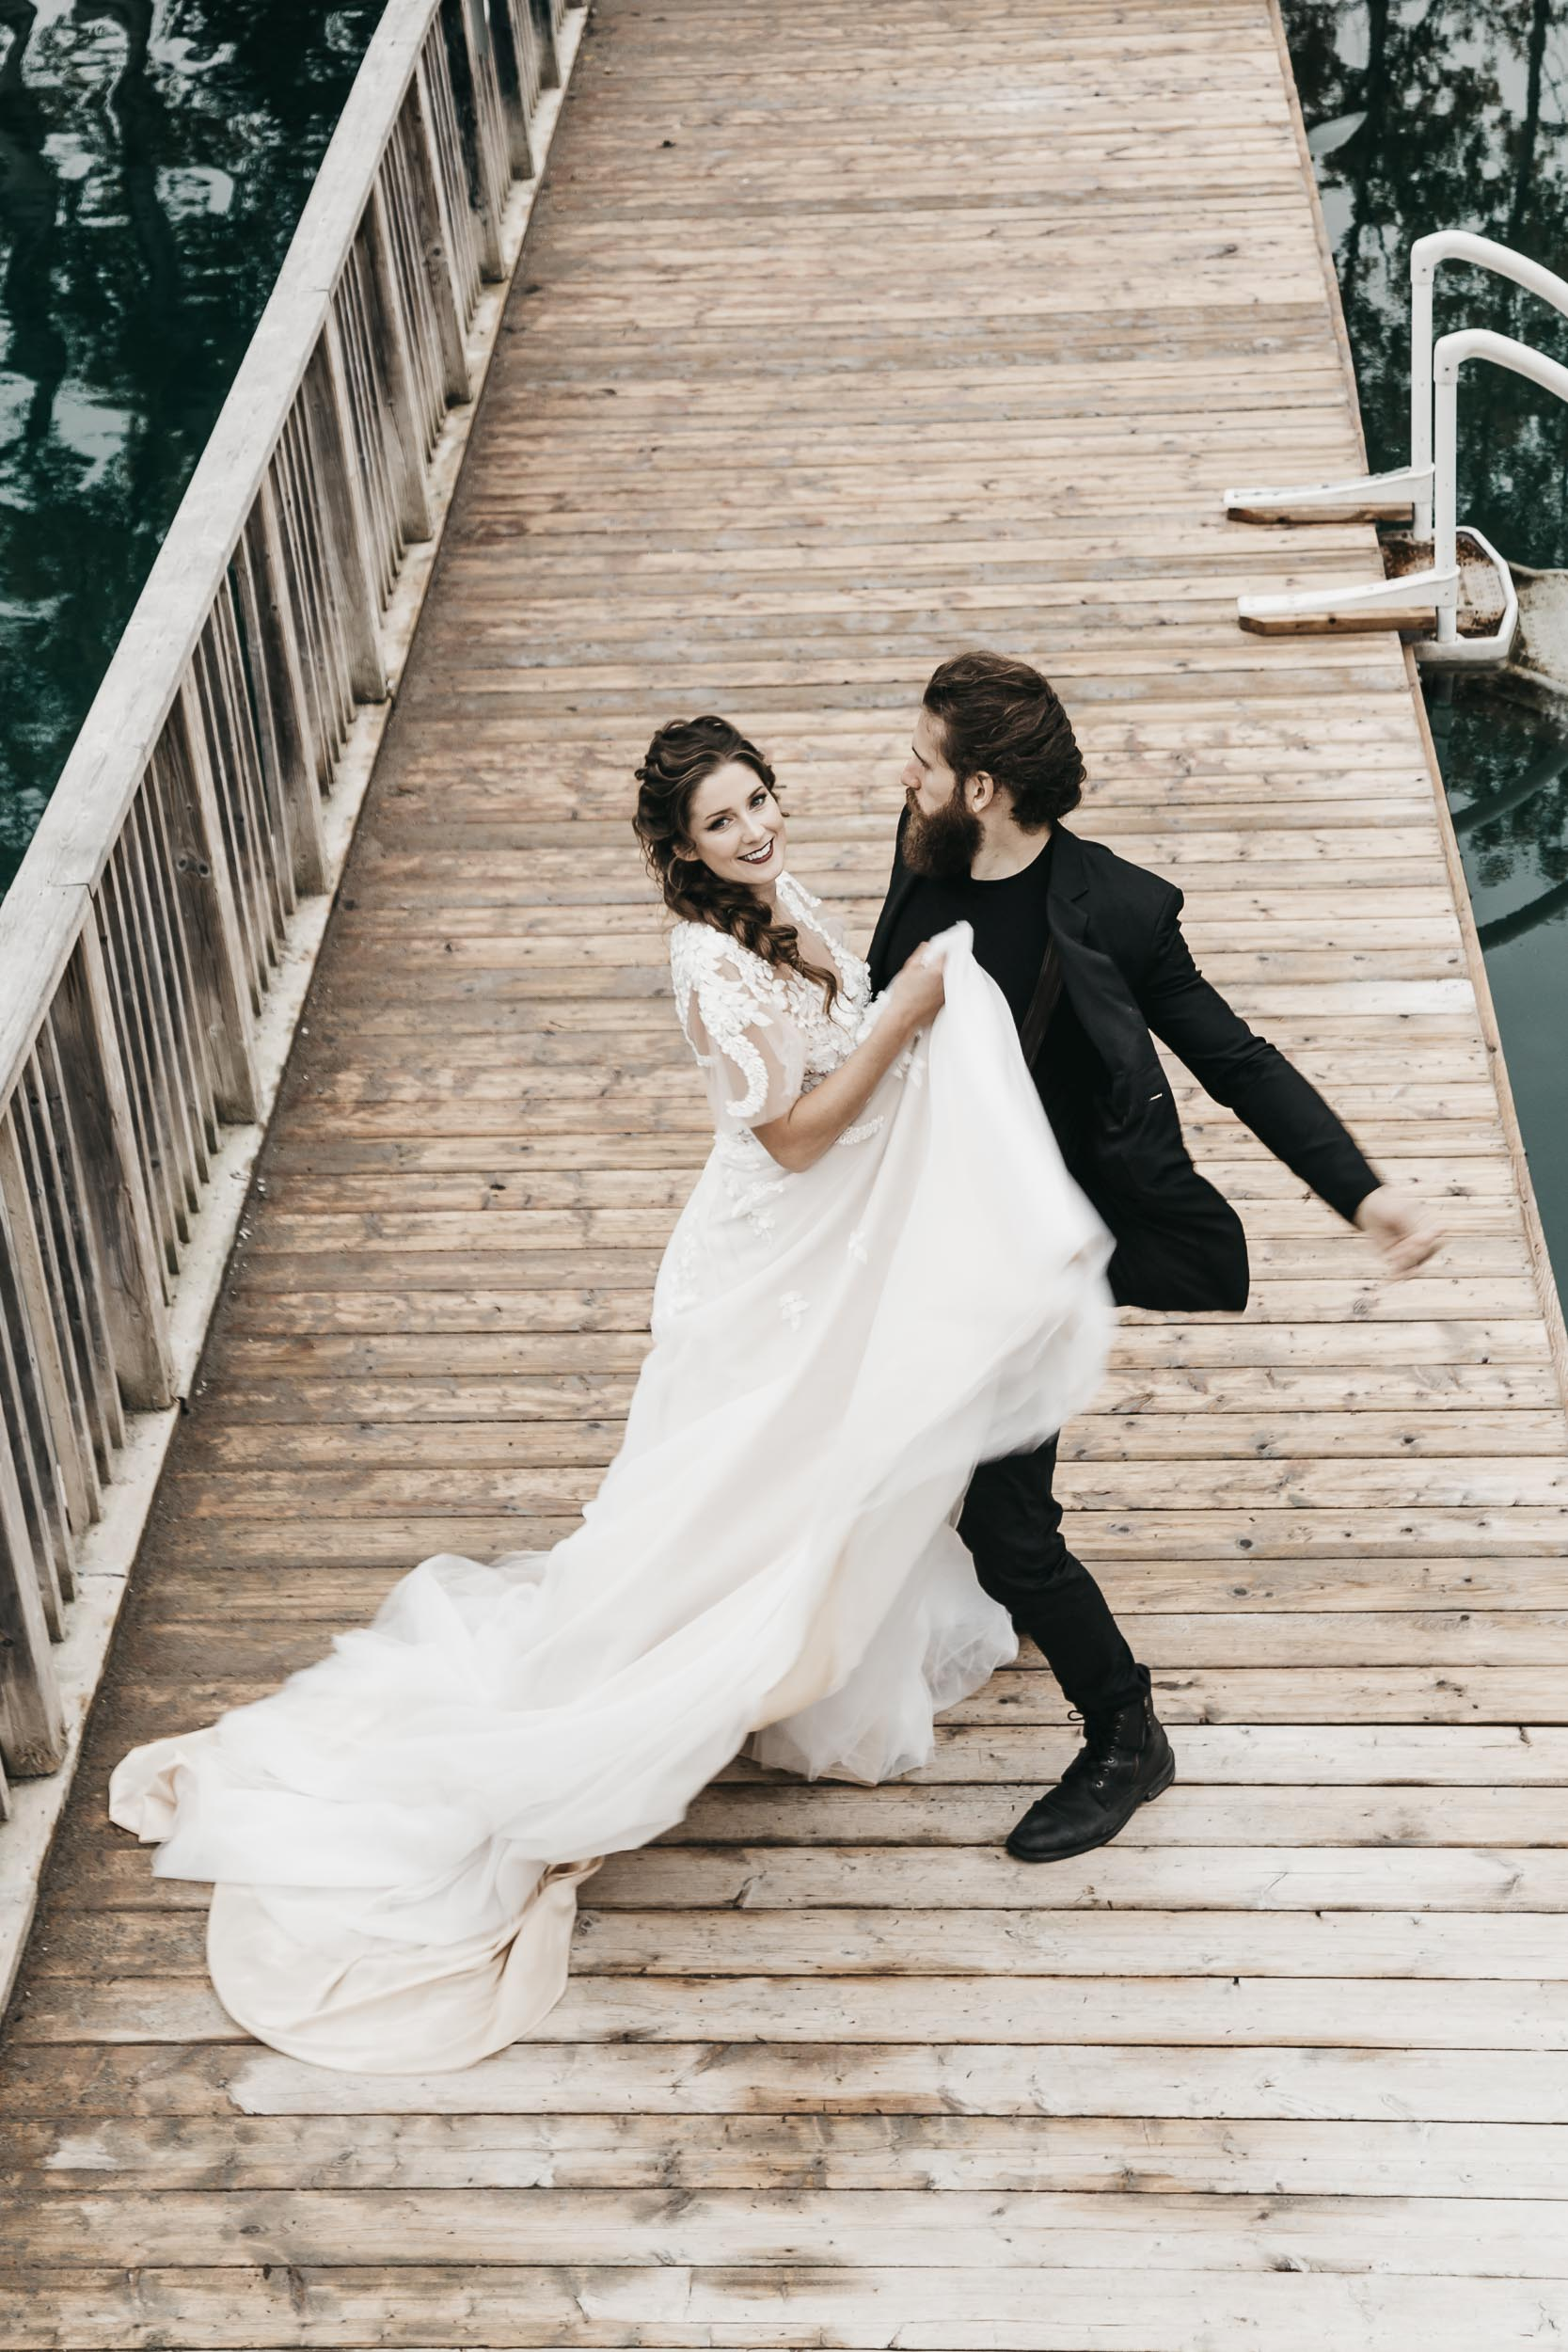 intimate-wedding-elopement-photographer-ottawa-toronto-0028.jpg